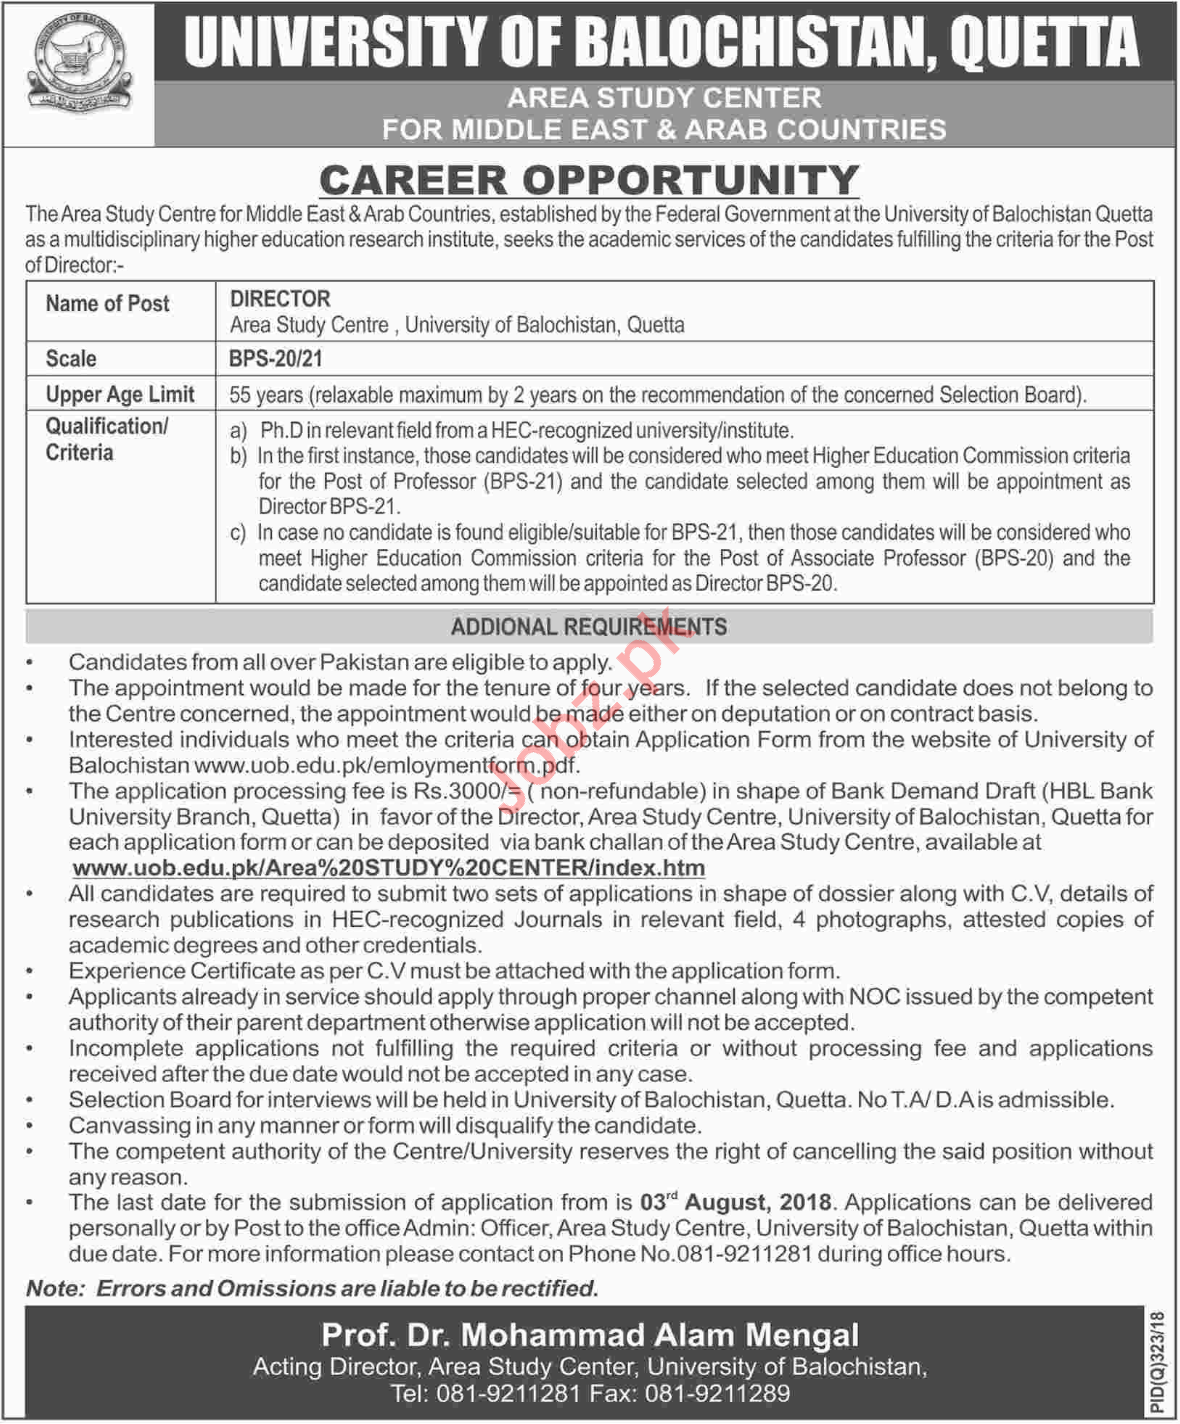 University of Balochistan Quetta Job 2018 Director